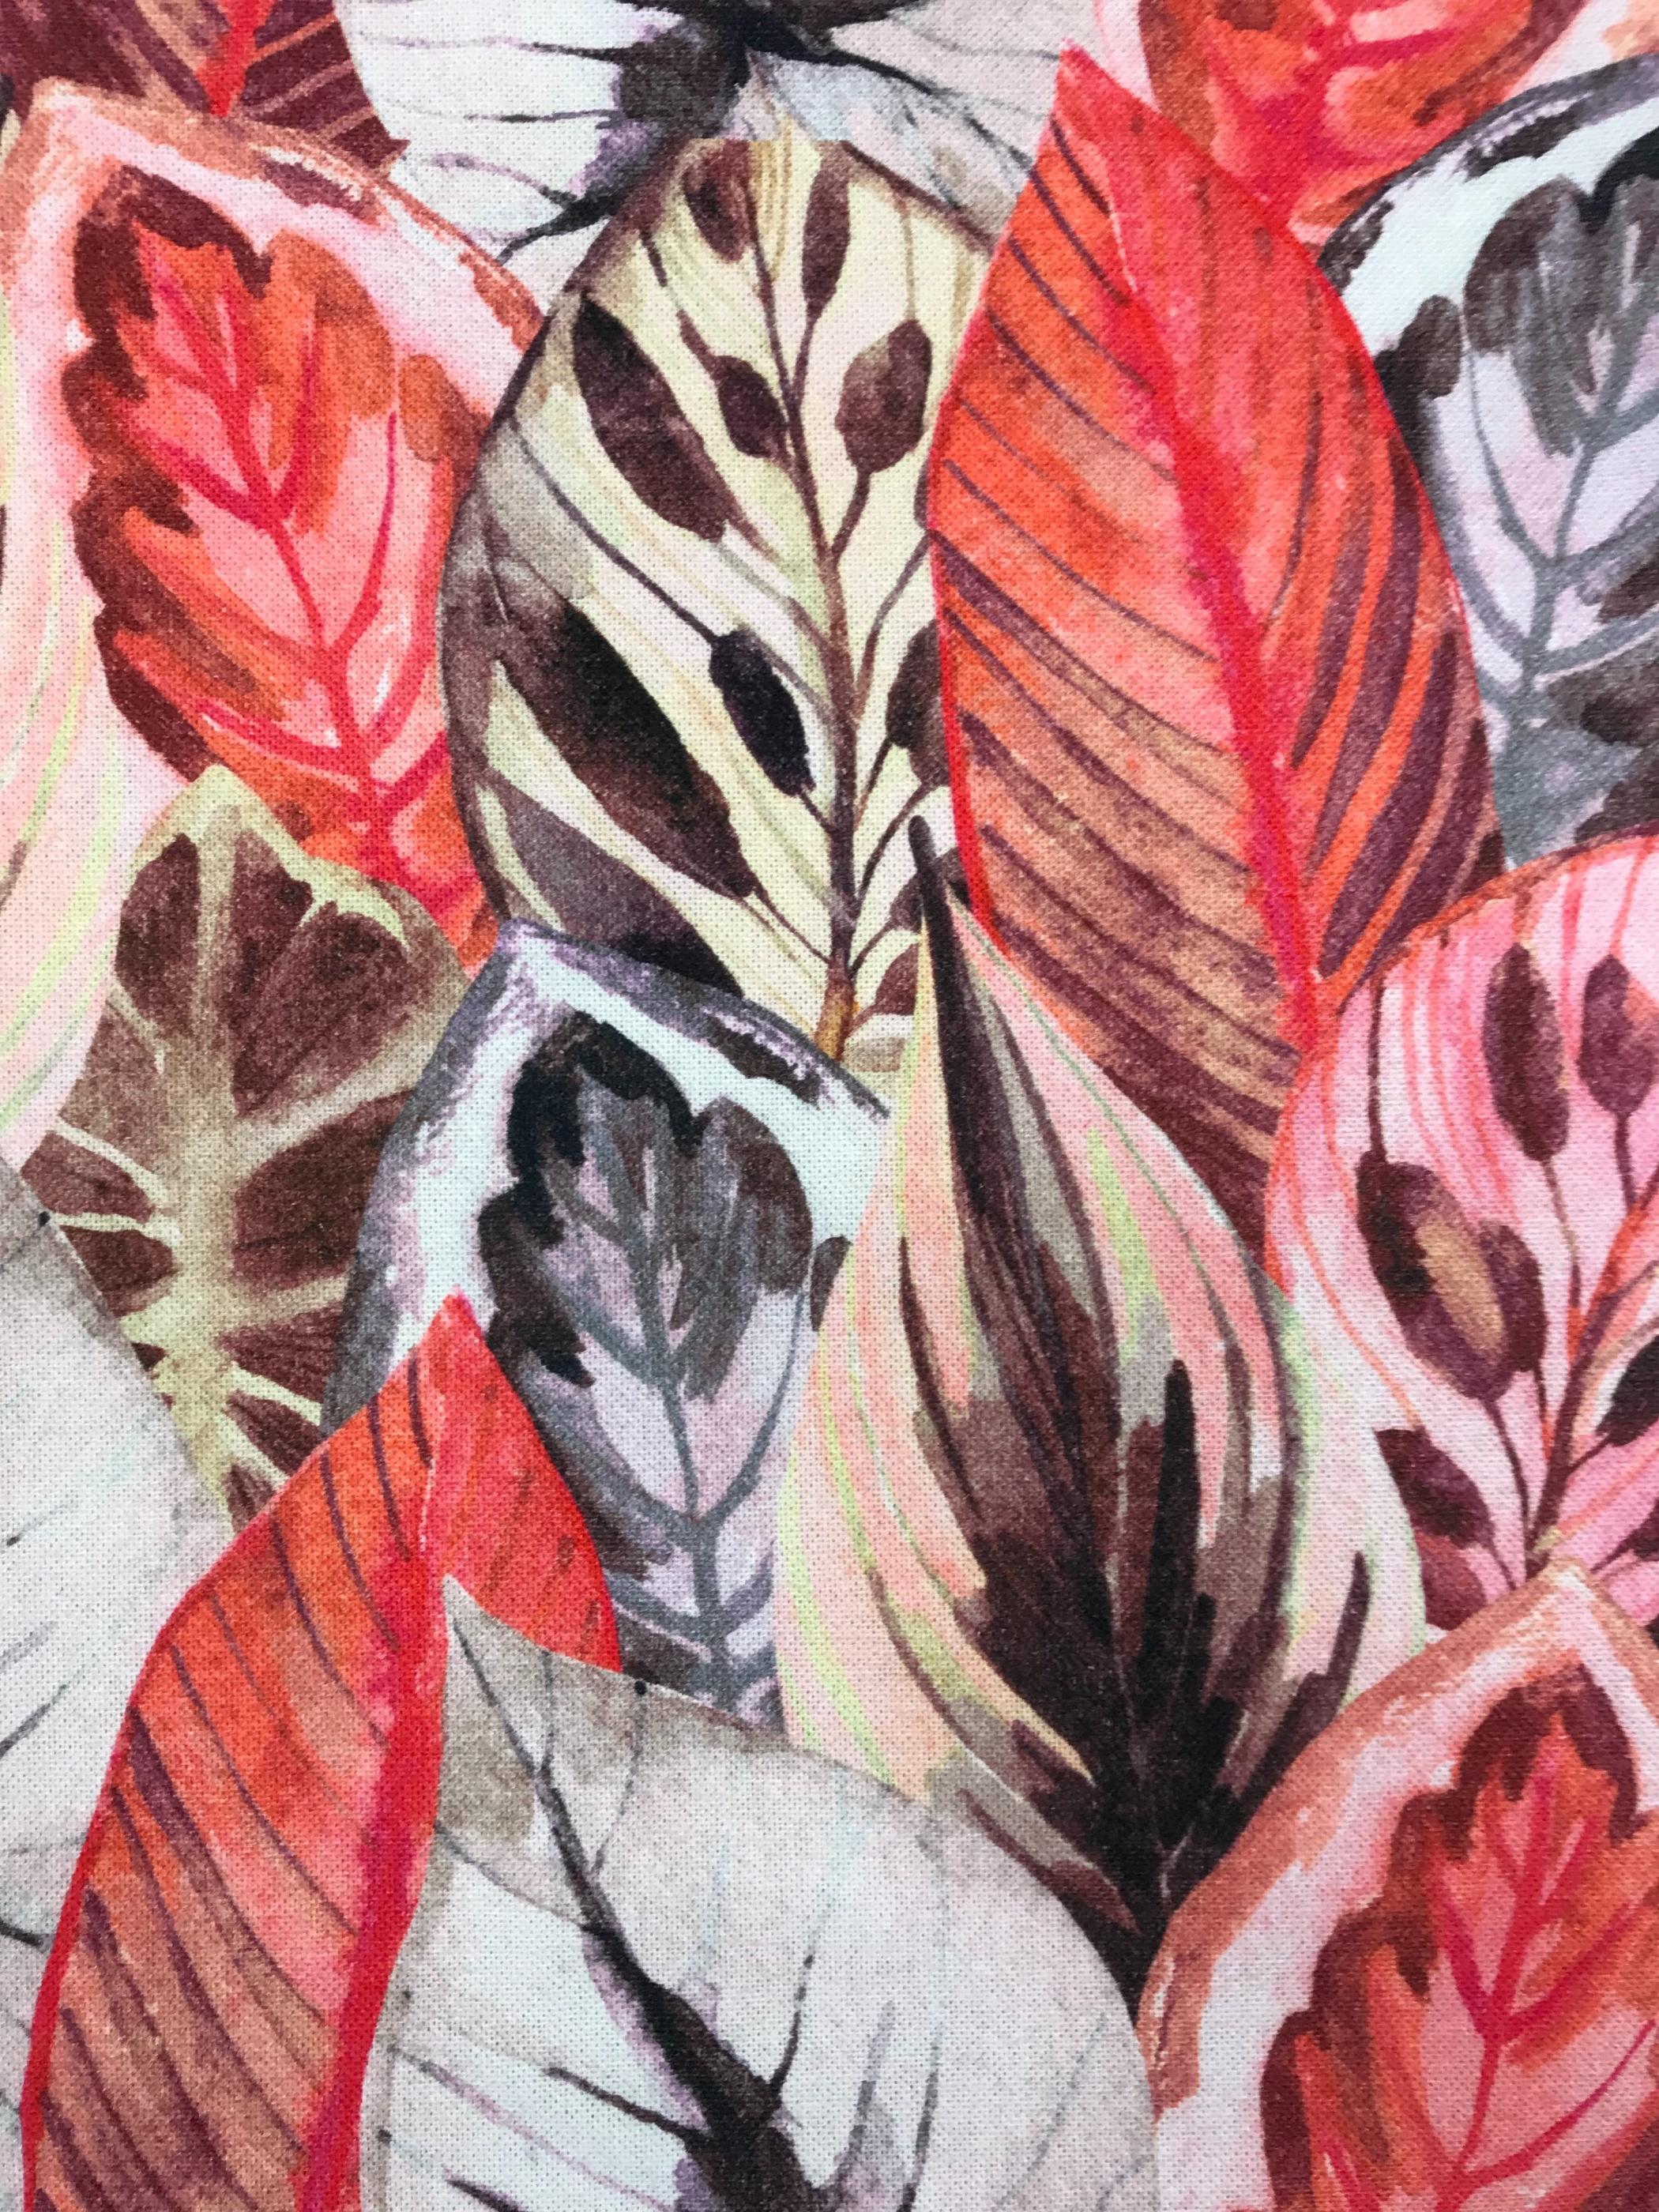 Löv blad metervara bomull hemtextil mode rosa röd brun grå